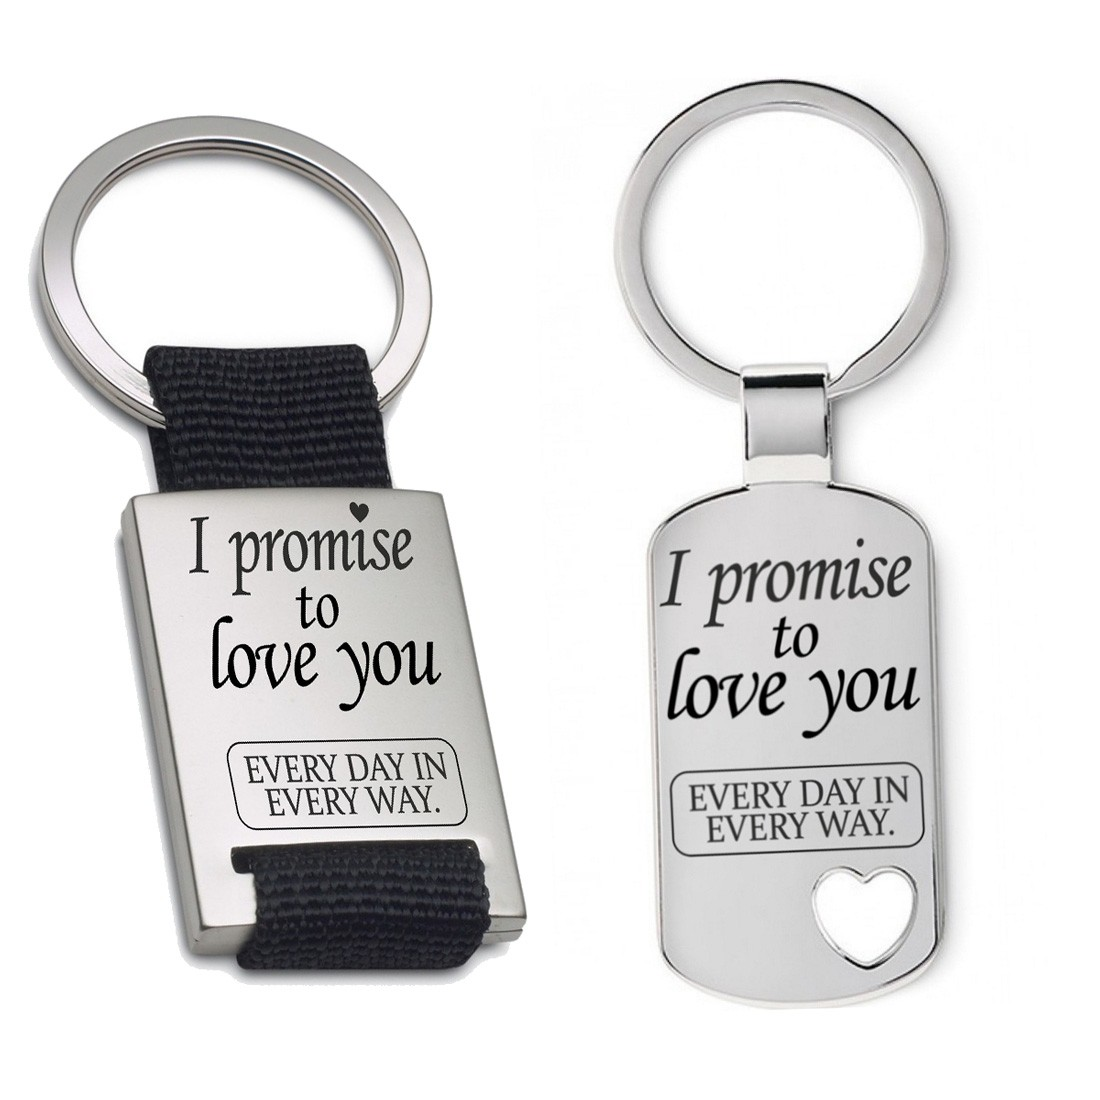 Schlüsselanhänger: I promise to love you